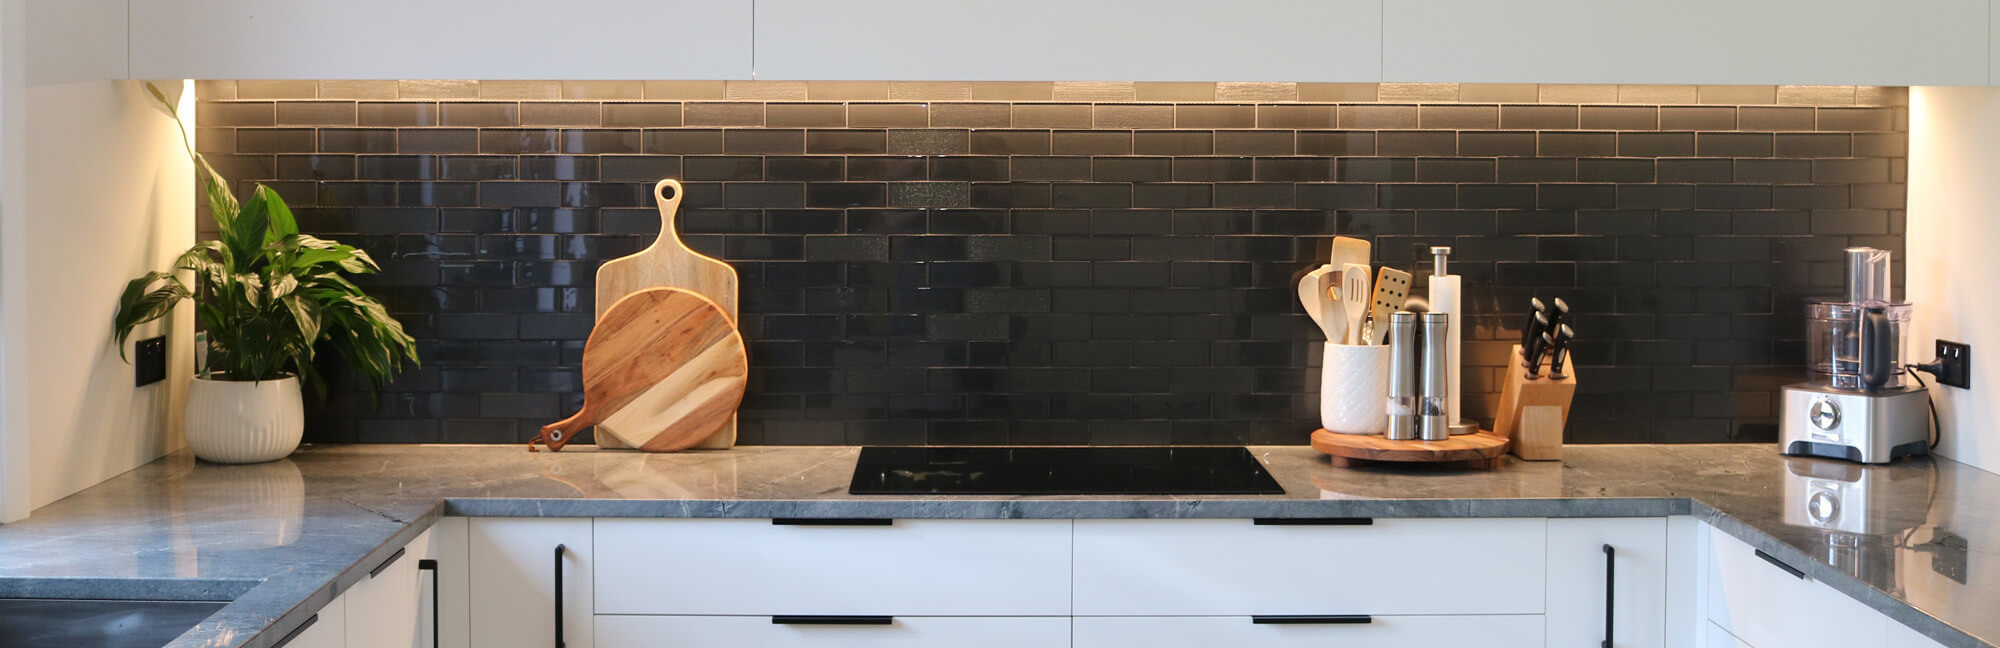 Custom Made Kitchens Wellington  Wright Kitchens Upper Hutt